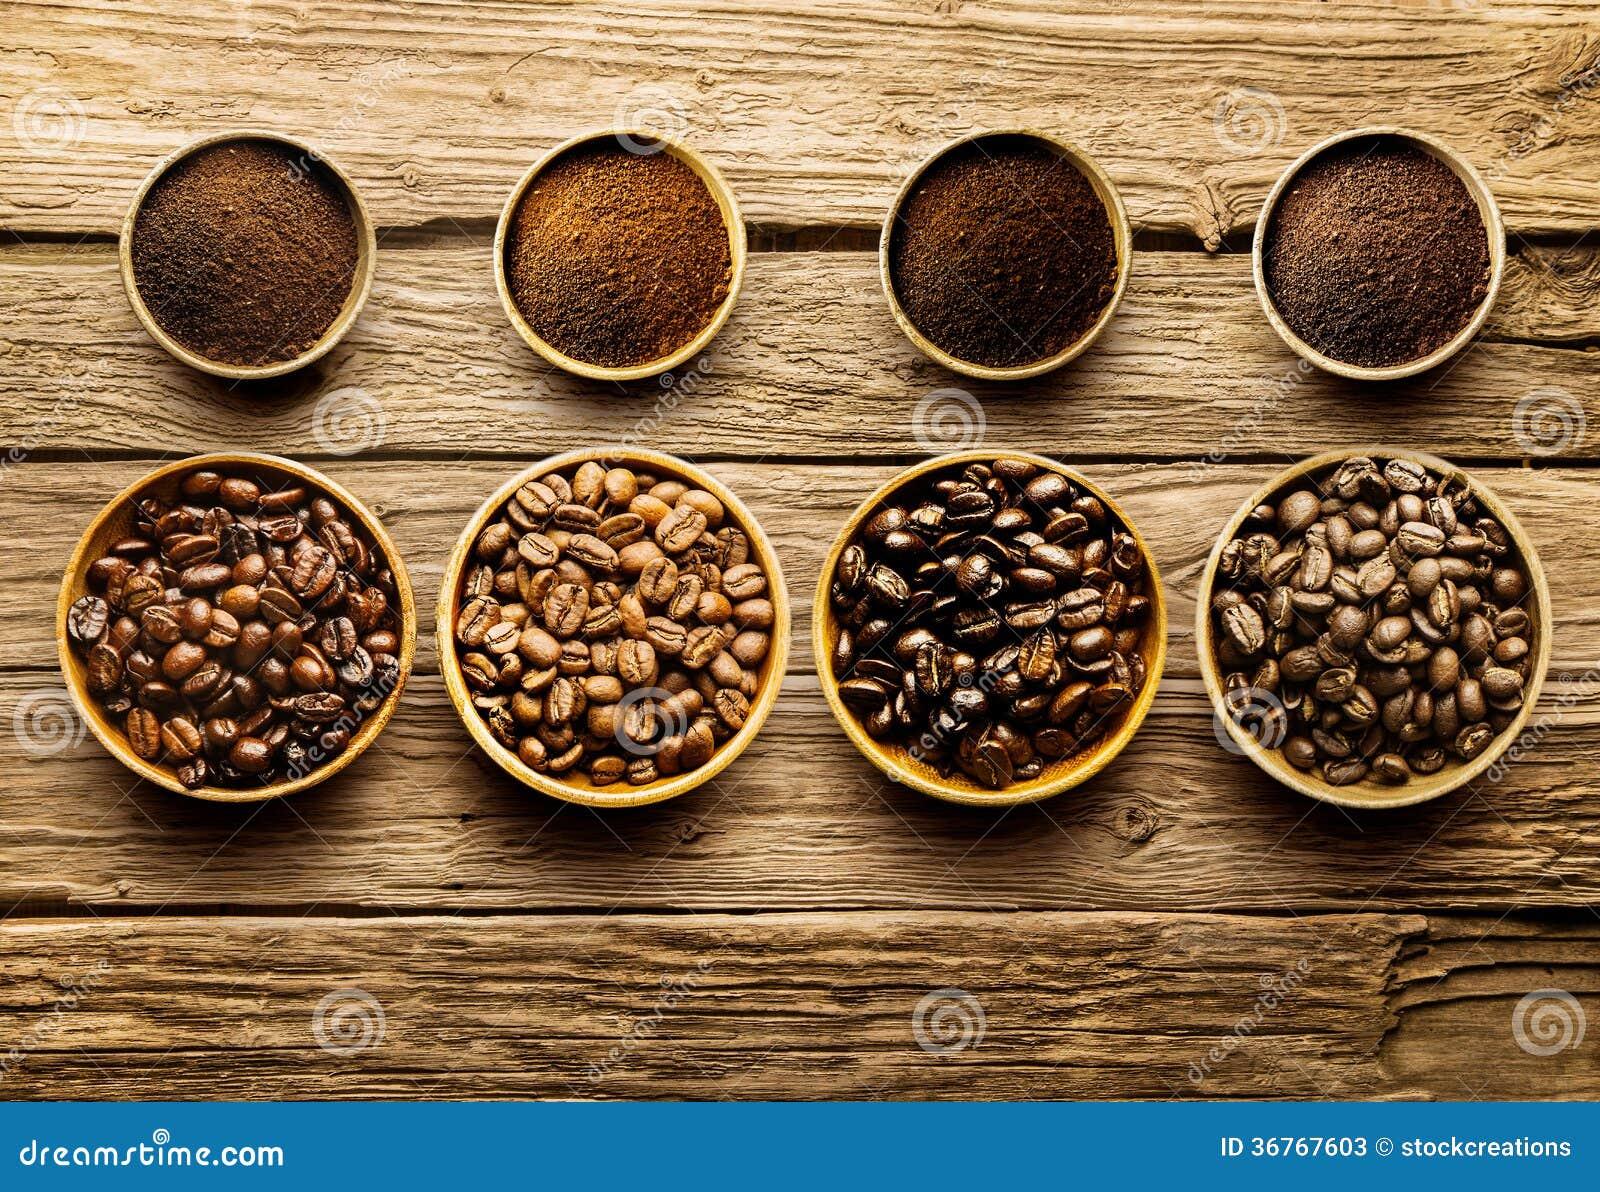 Preparing fresh roast coffee beans to brew